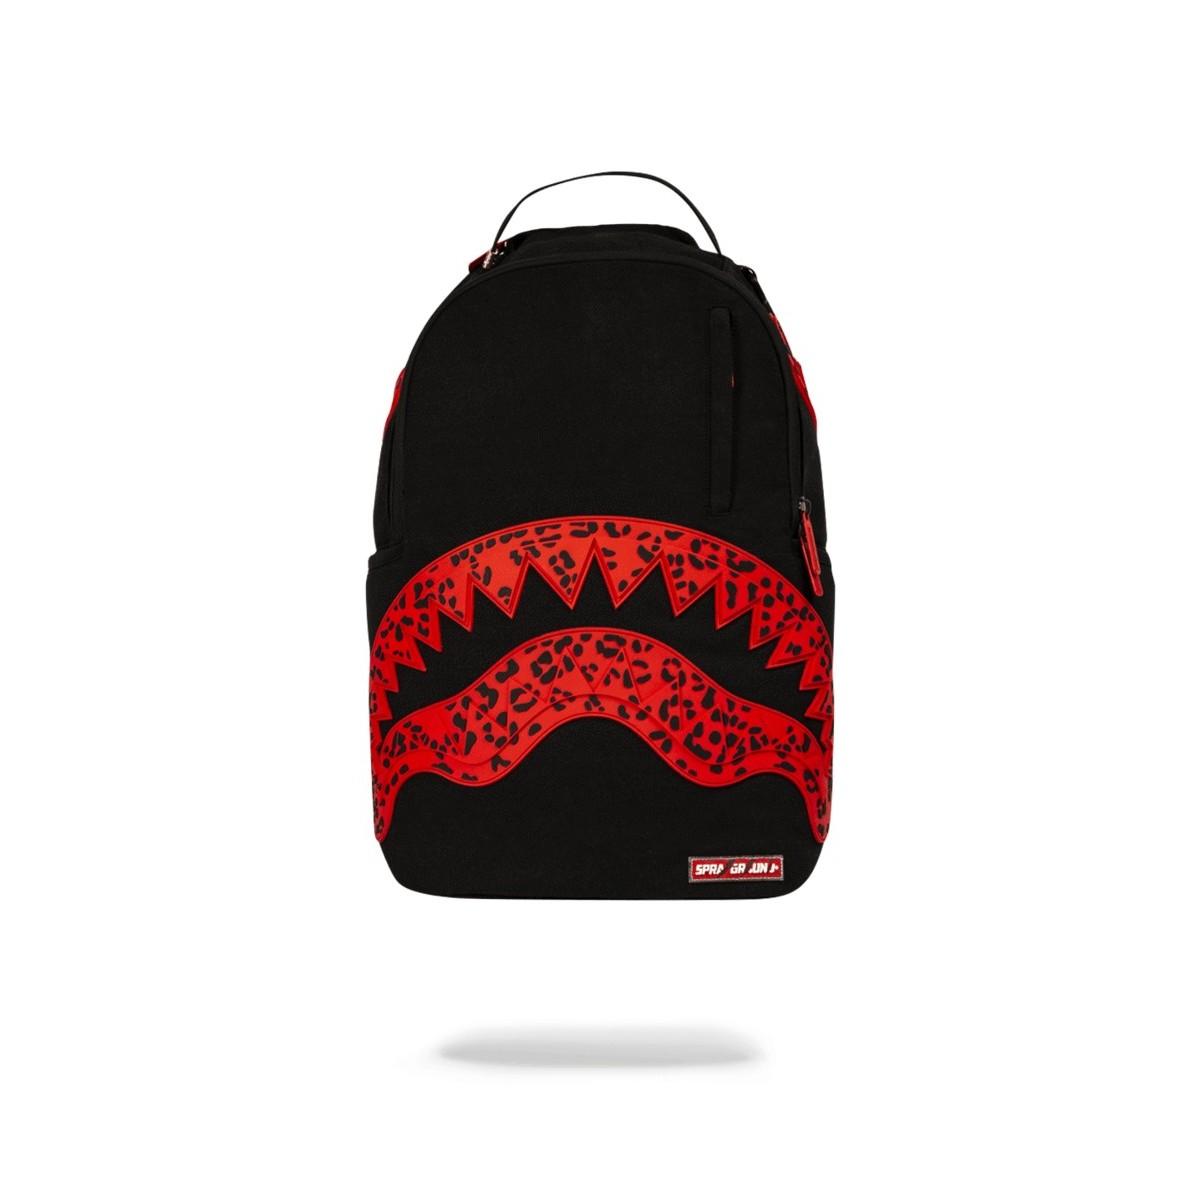 Backpacks Sprayground - Red leopard shark mouth